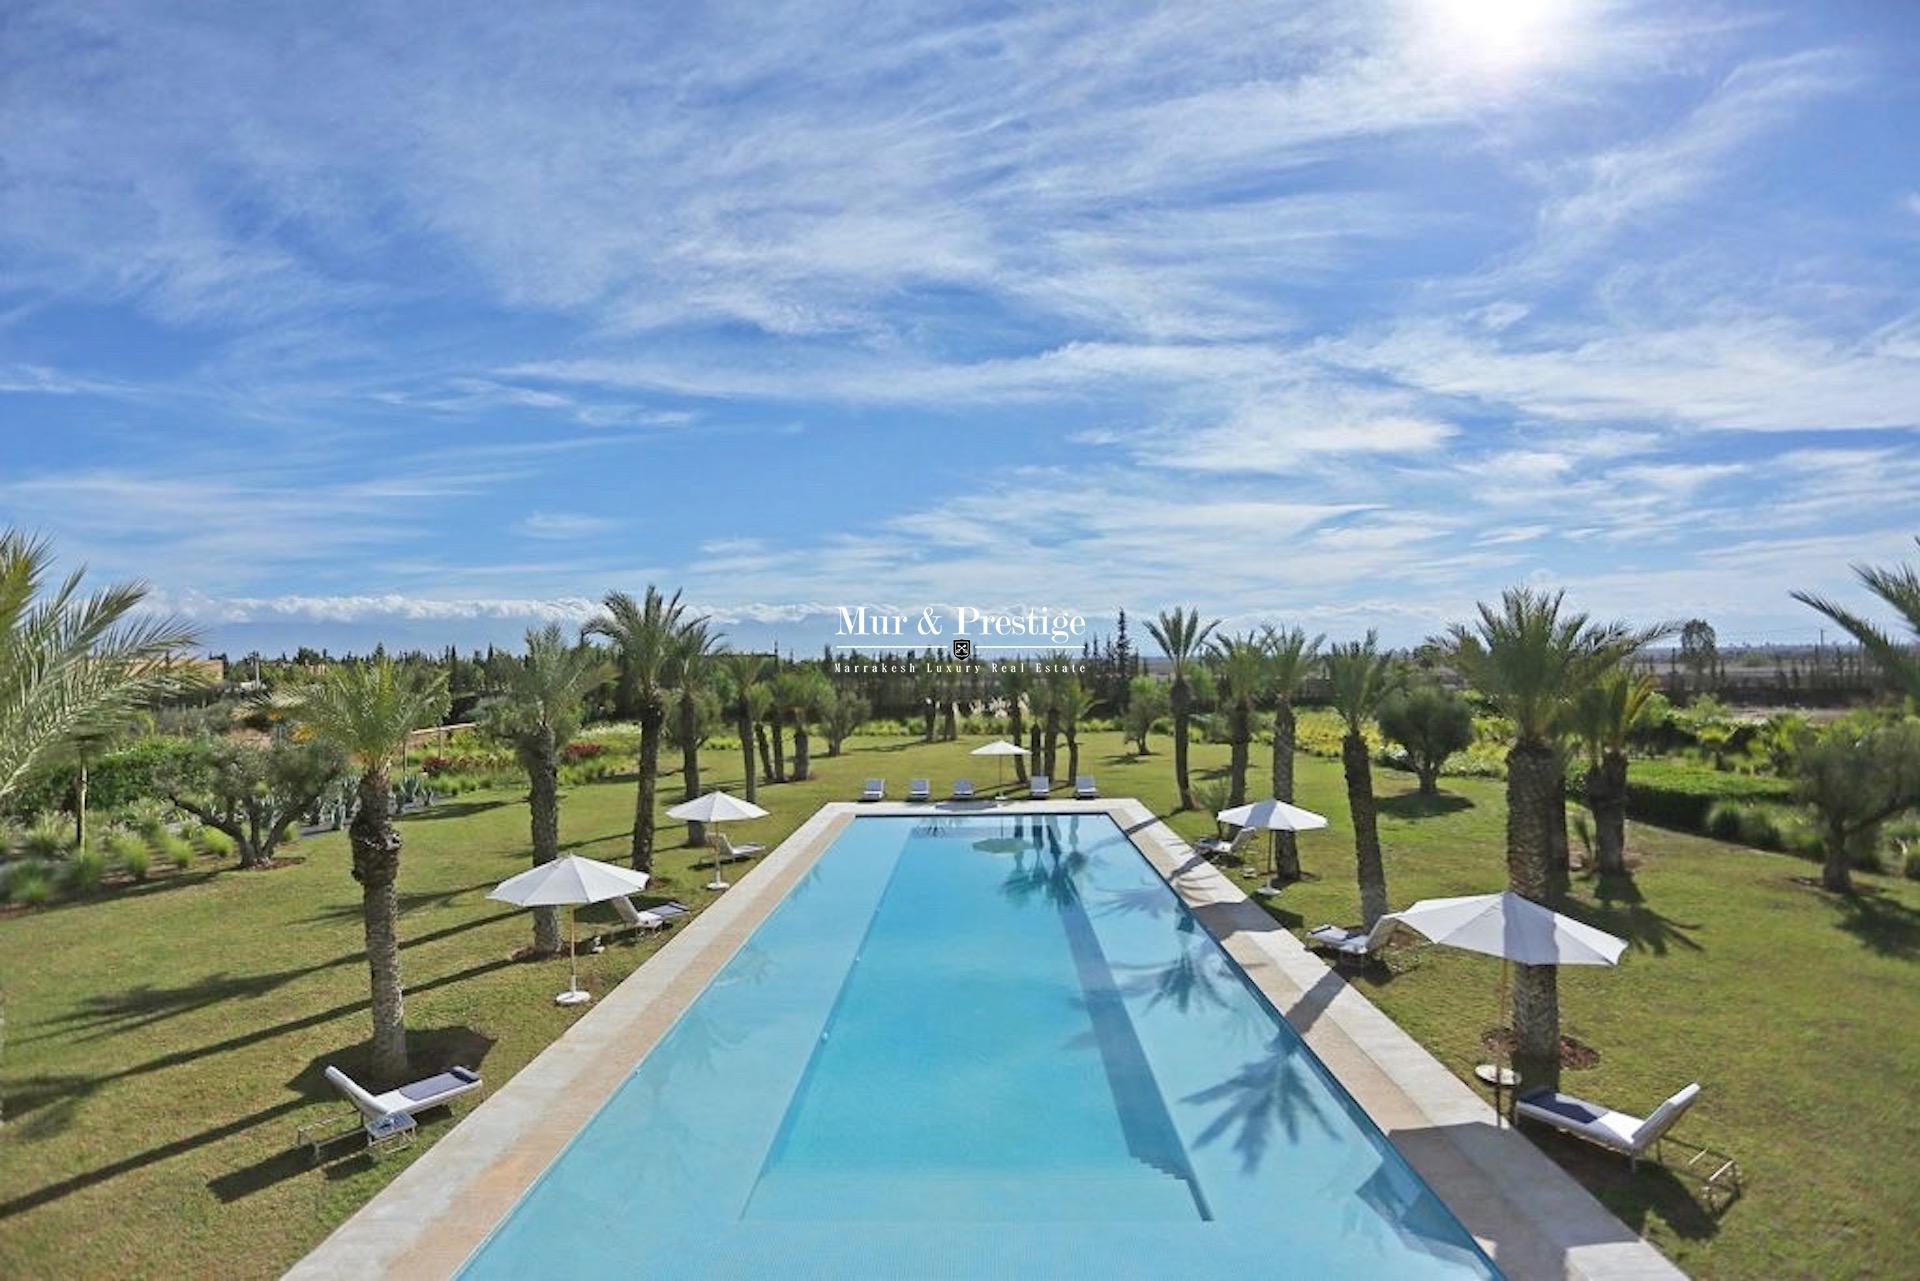 Villa de prestige à la location à Marrakech